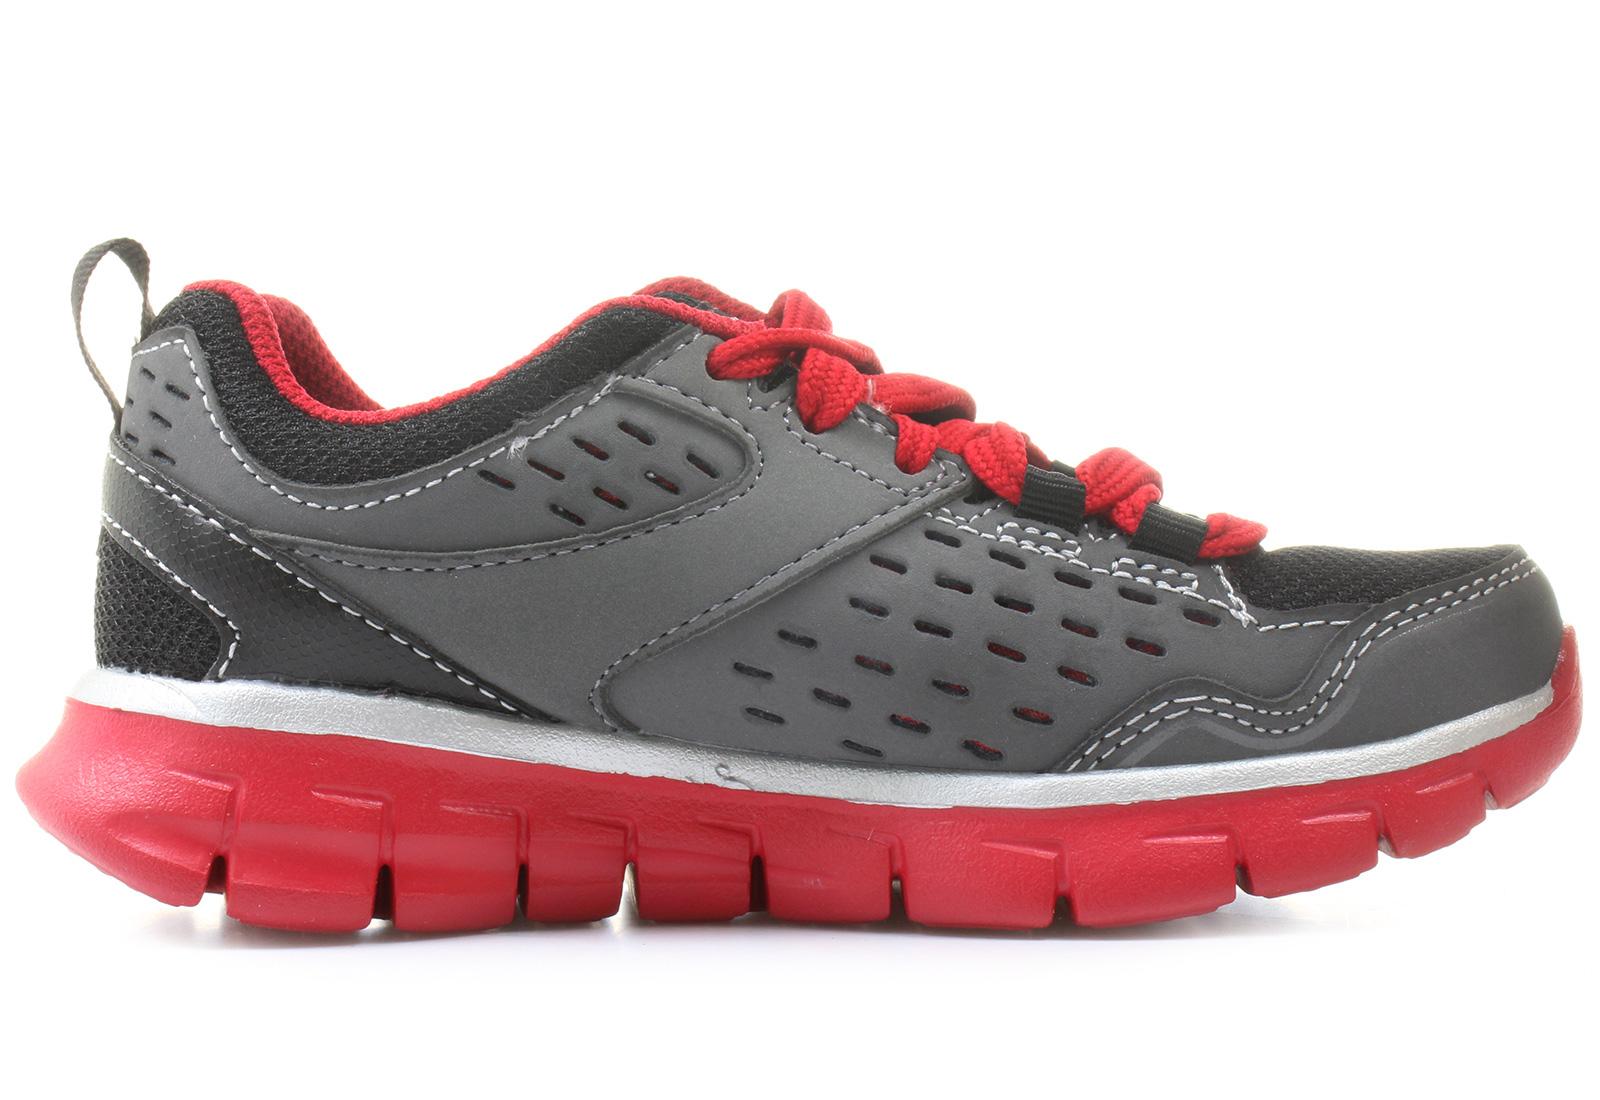 f6a8b3afb3 Skechers Cipő - Immunity - 95494L-ccrd - Online shop for sneakers ...